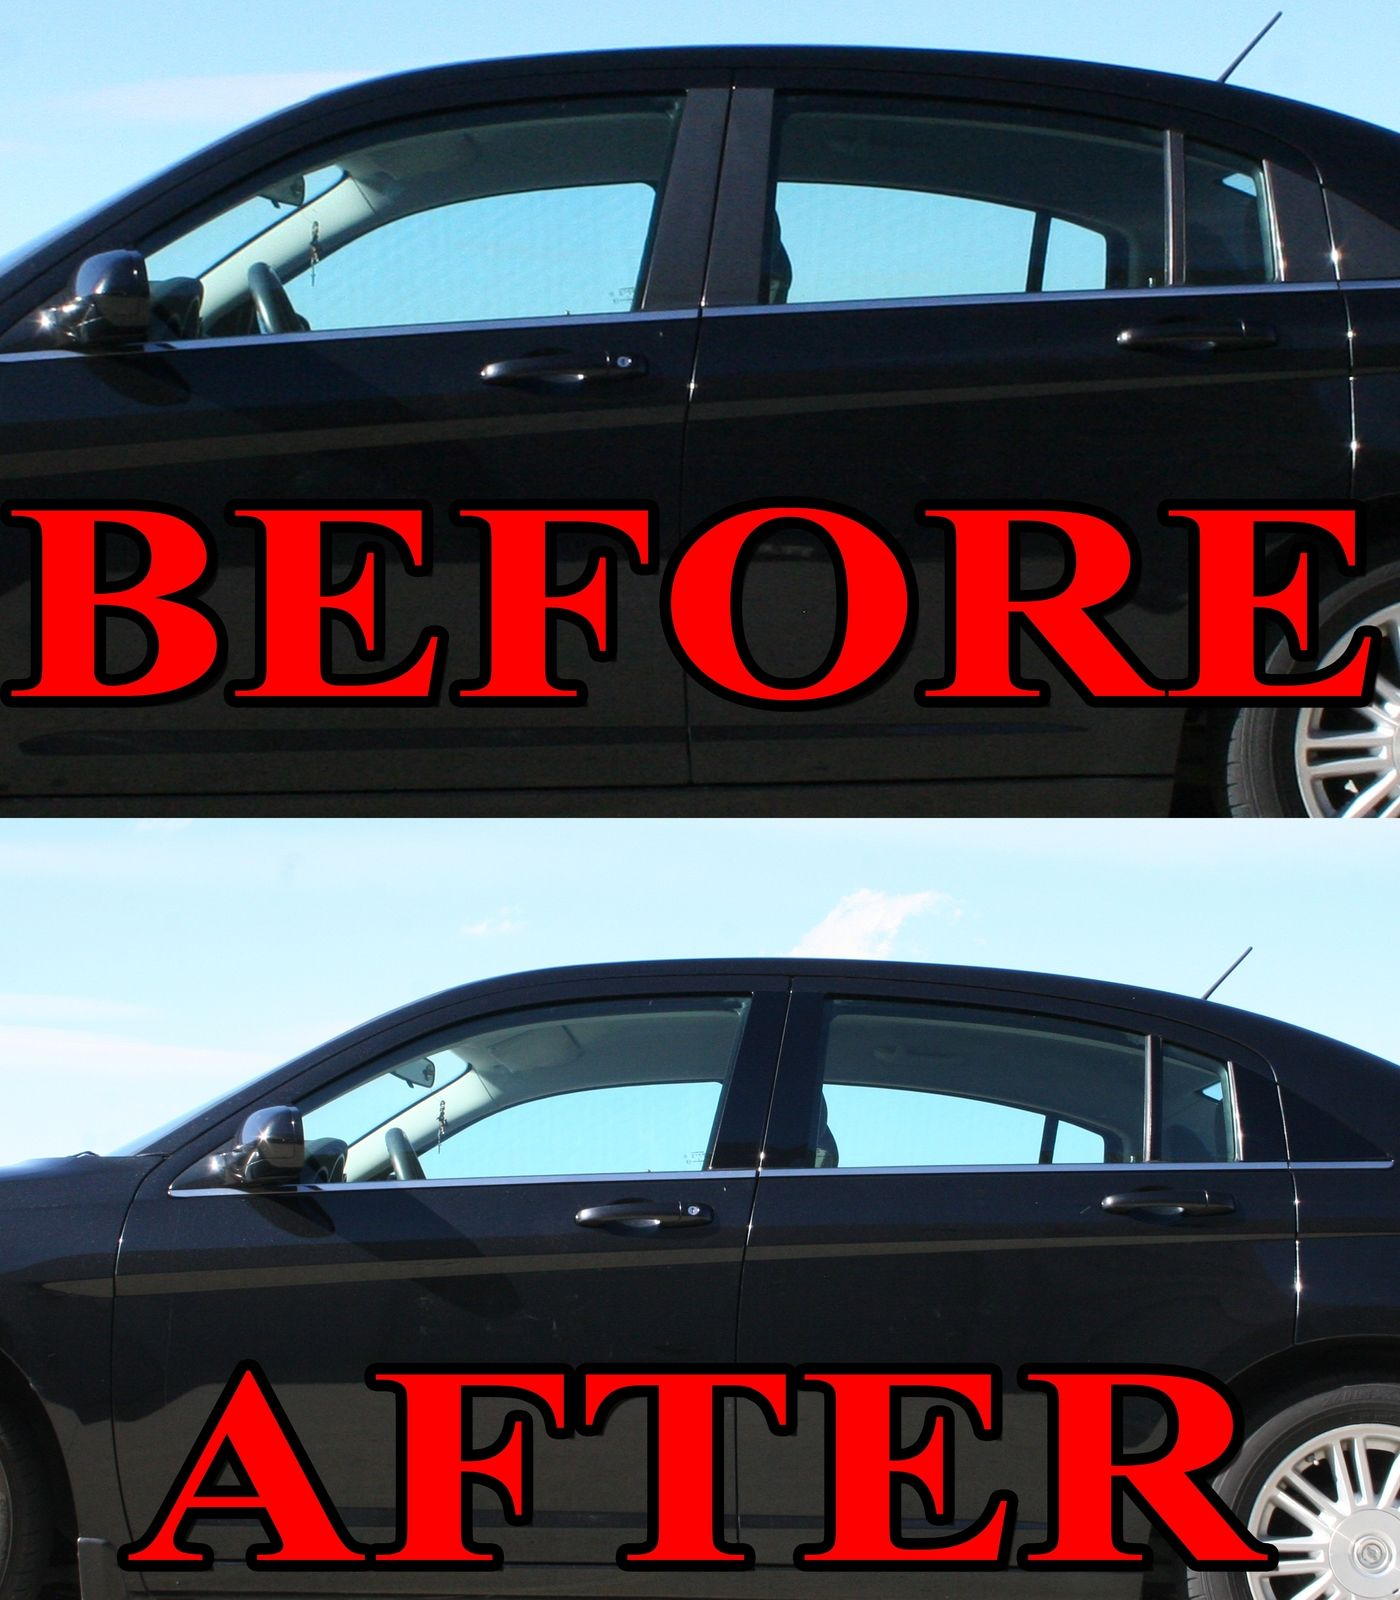 04-09 6pc Set Door Trim Cover Kit Black Pillar Posts for Mazda 3 5dr Hatch